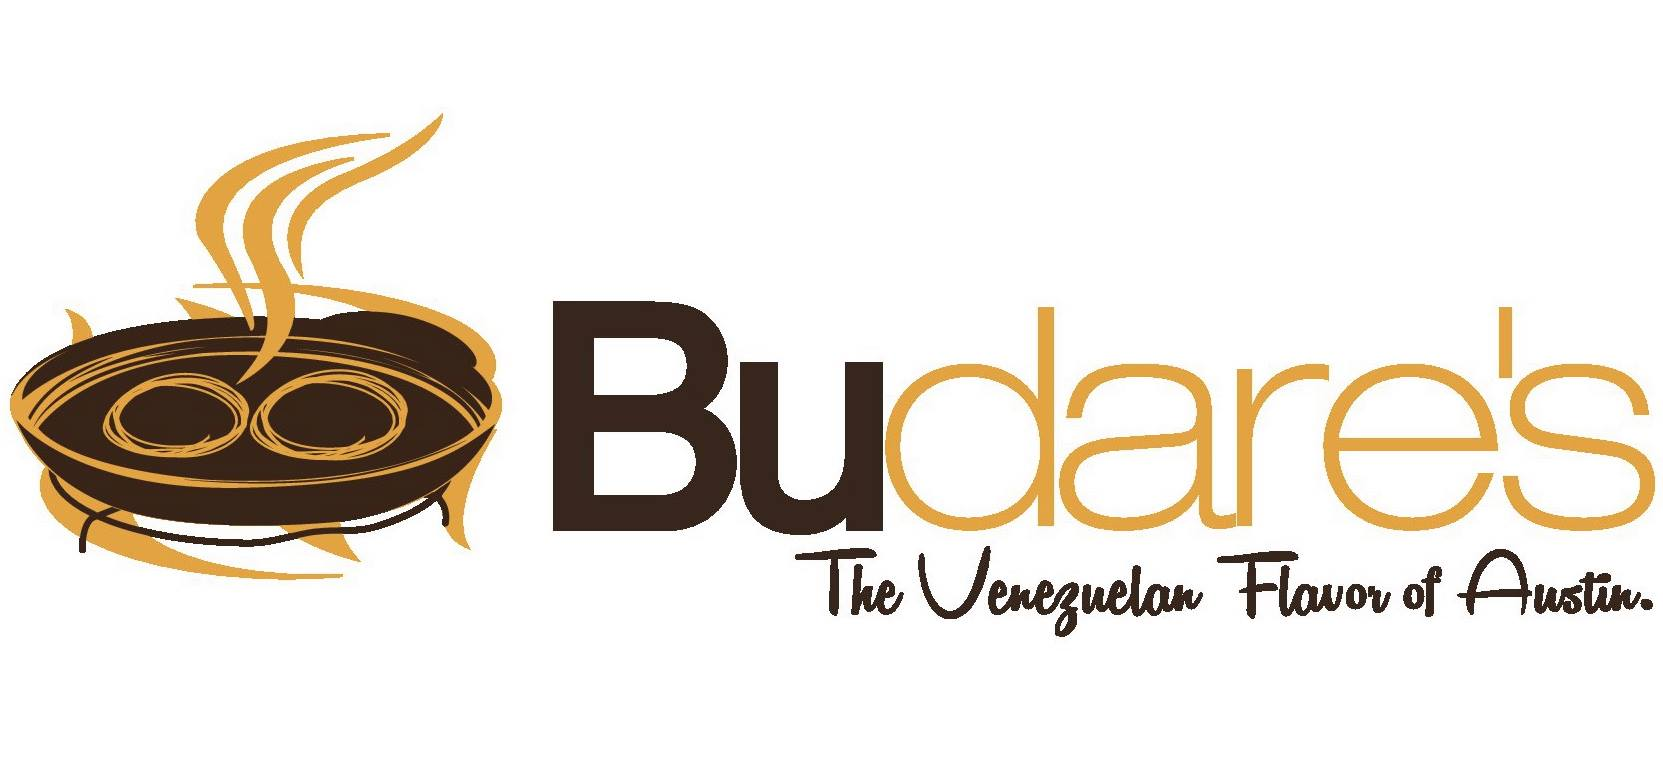 Budare's logo